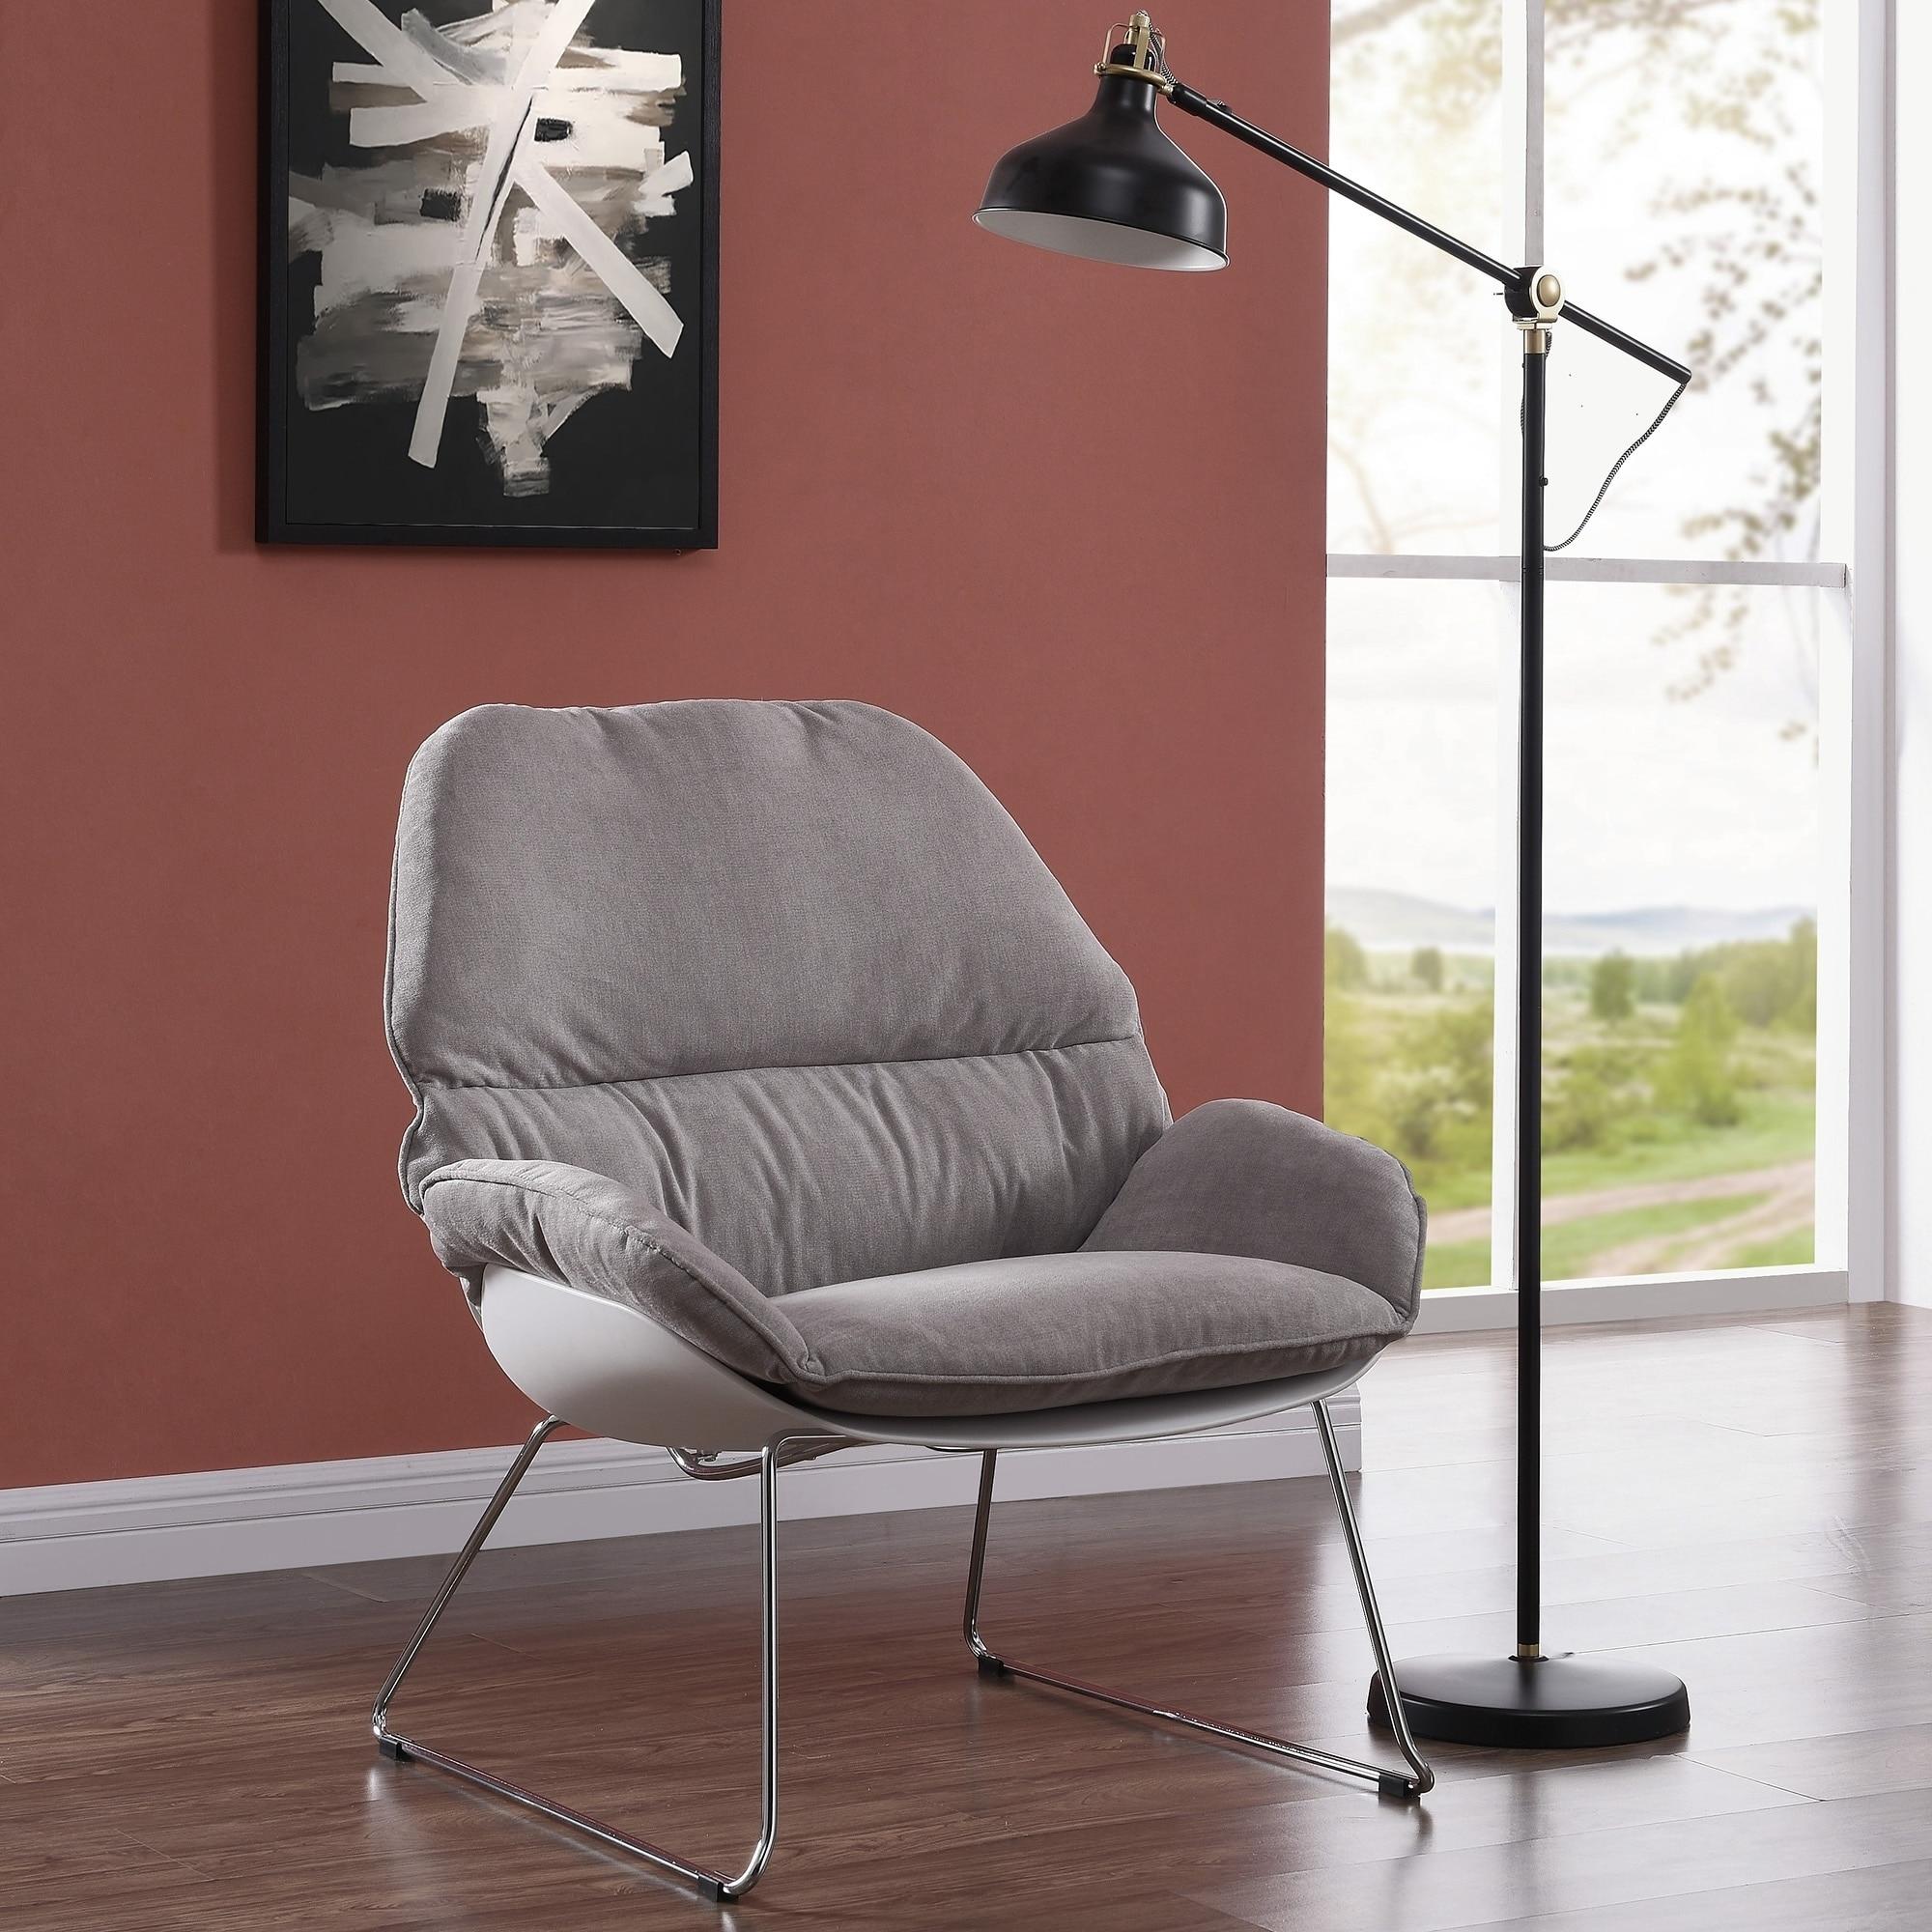 Wondrous Finn Accent Chair Charcoal Unemploymentrelief Wooden Chair Designs For Living Room Unemploymentrelieforg